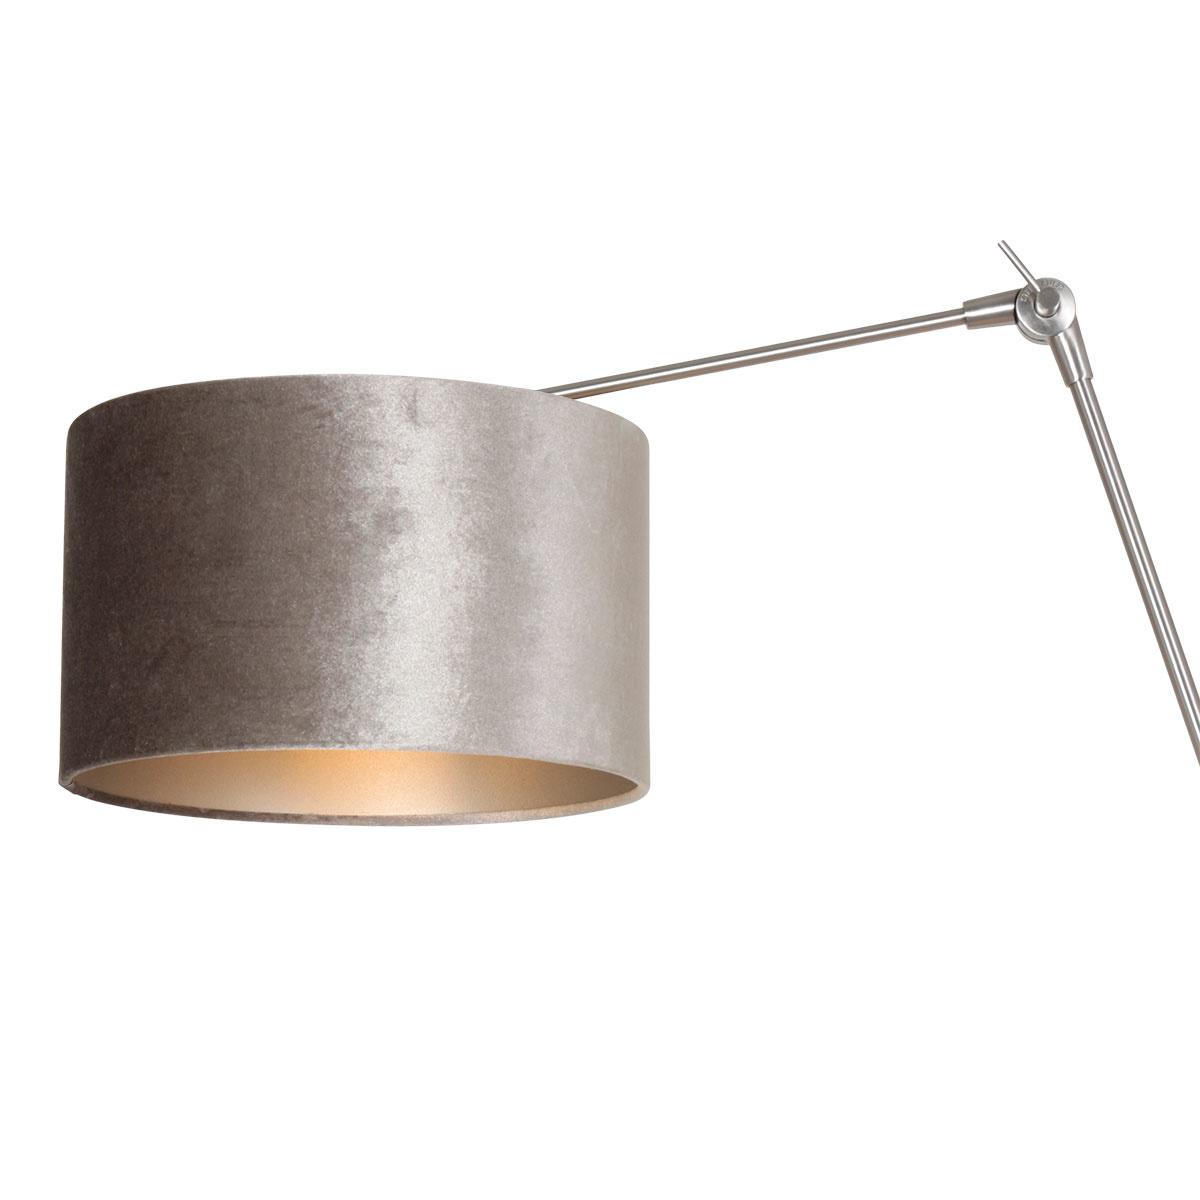 Steinhauer Wandlamp prestige chic 8110 staal kap zilver velours